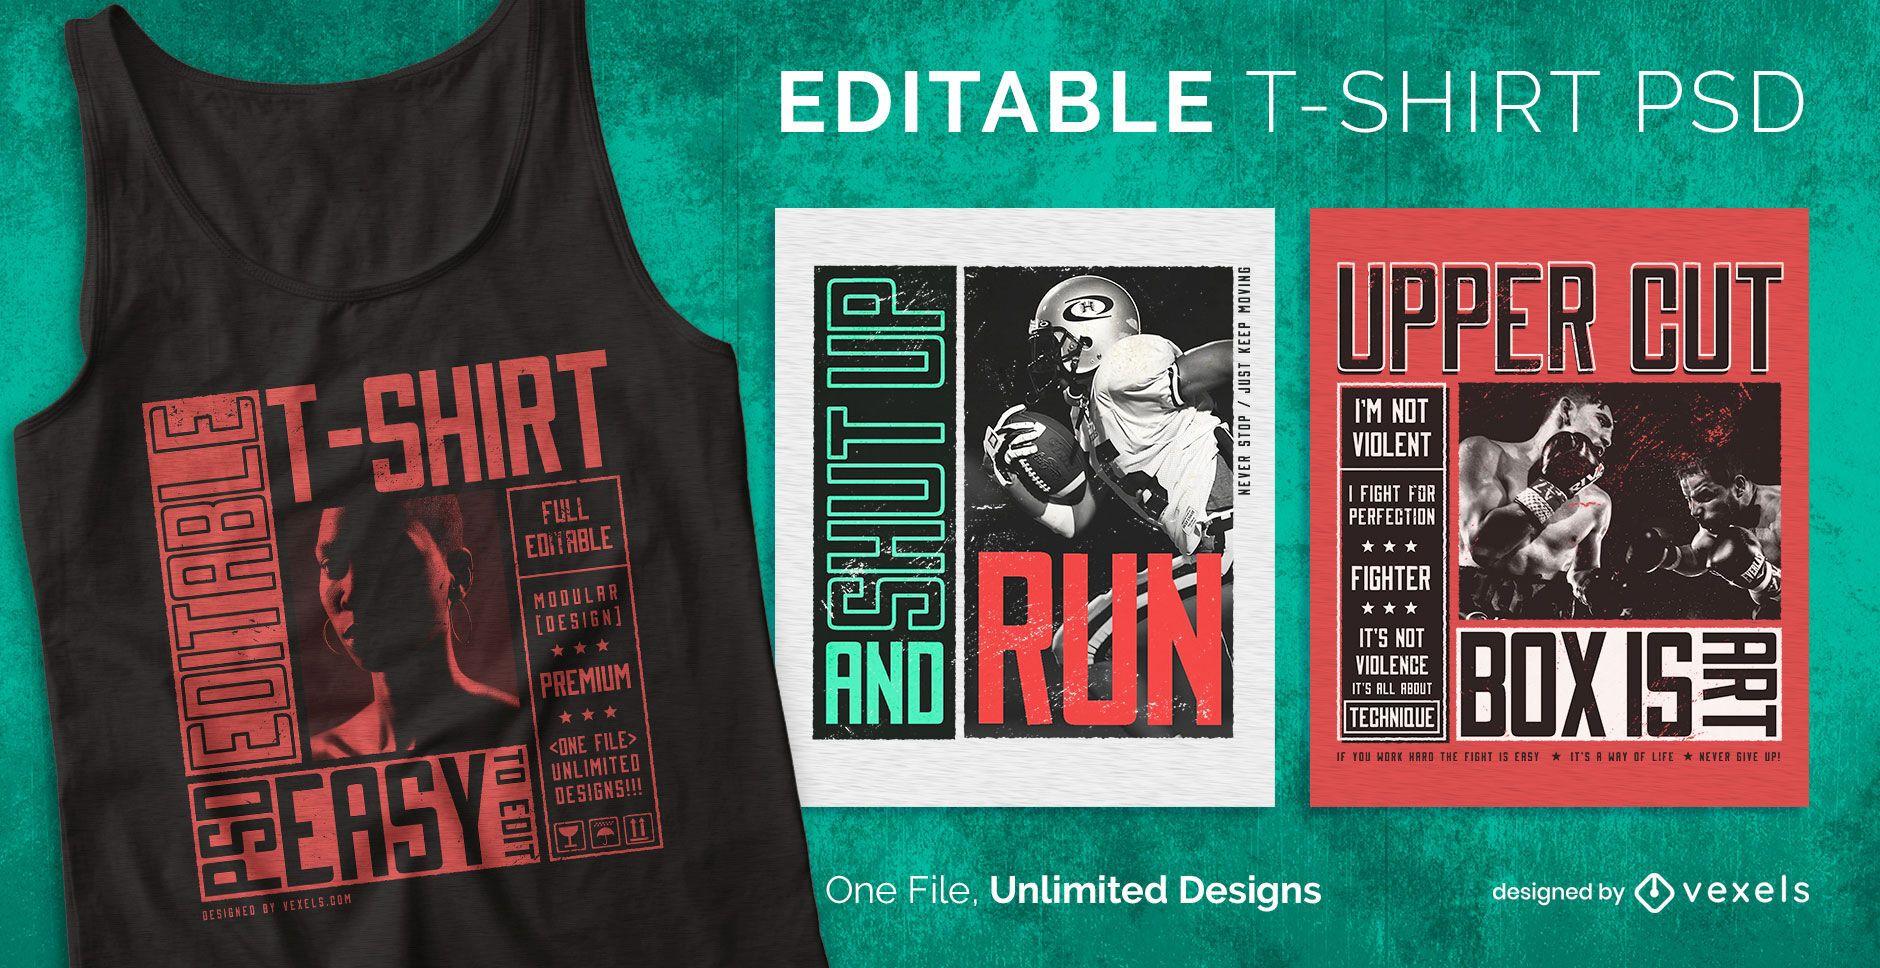 Bearbeitbares T-Shirt-Design im quadratischen Poster-Stil